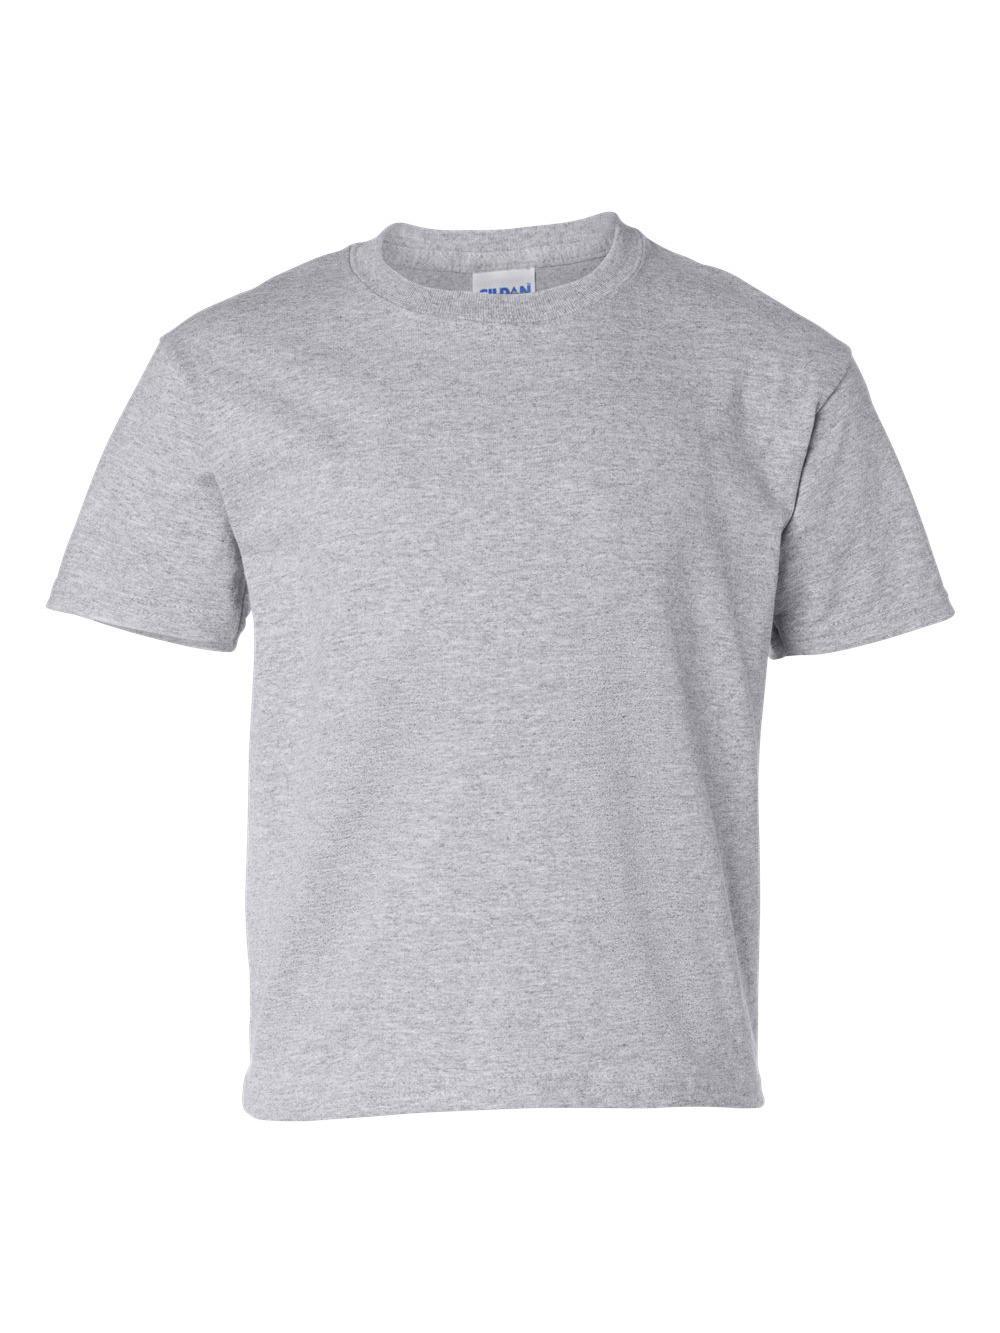 Gildan-Ultra-Cotton-T-Shirt-Tall-Sizes-2000T thumbnail 21